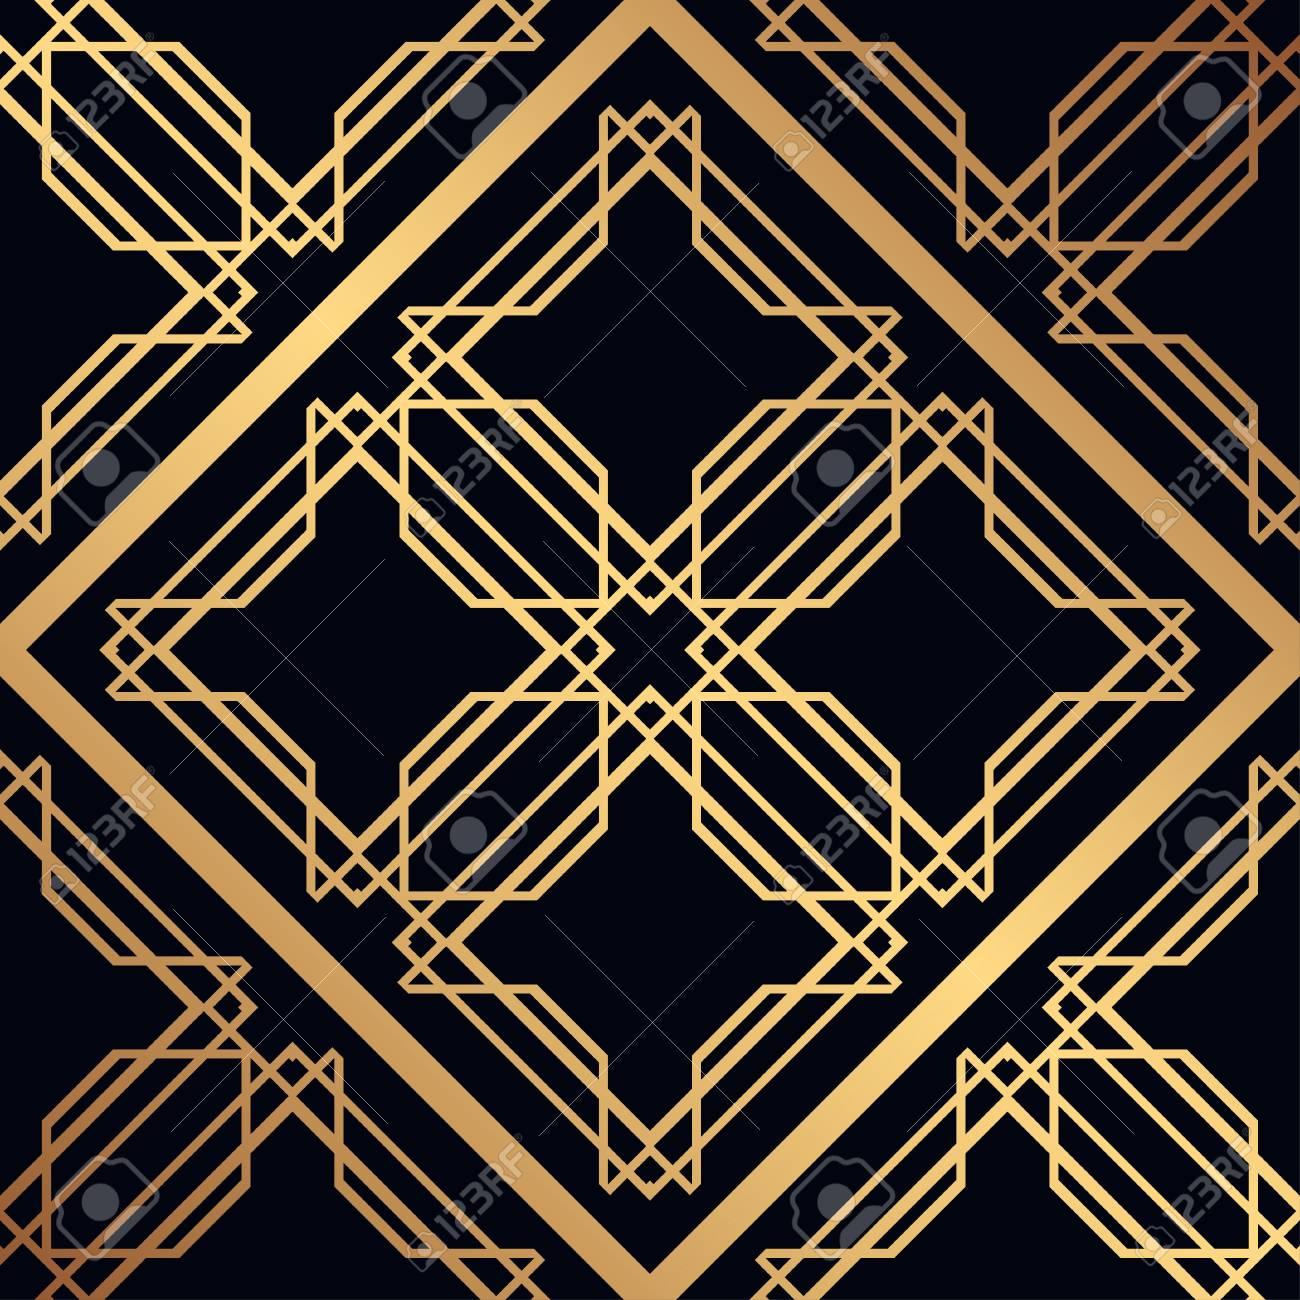 Deko Ornament.Vintage Ornamental Seamless Pattern Art Deco Ornament Template